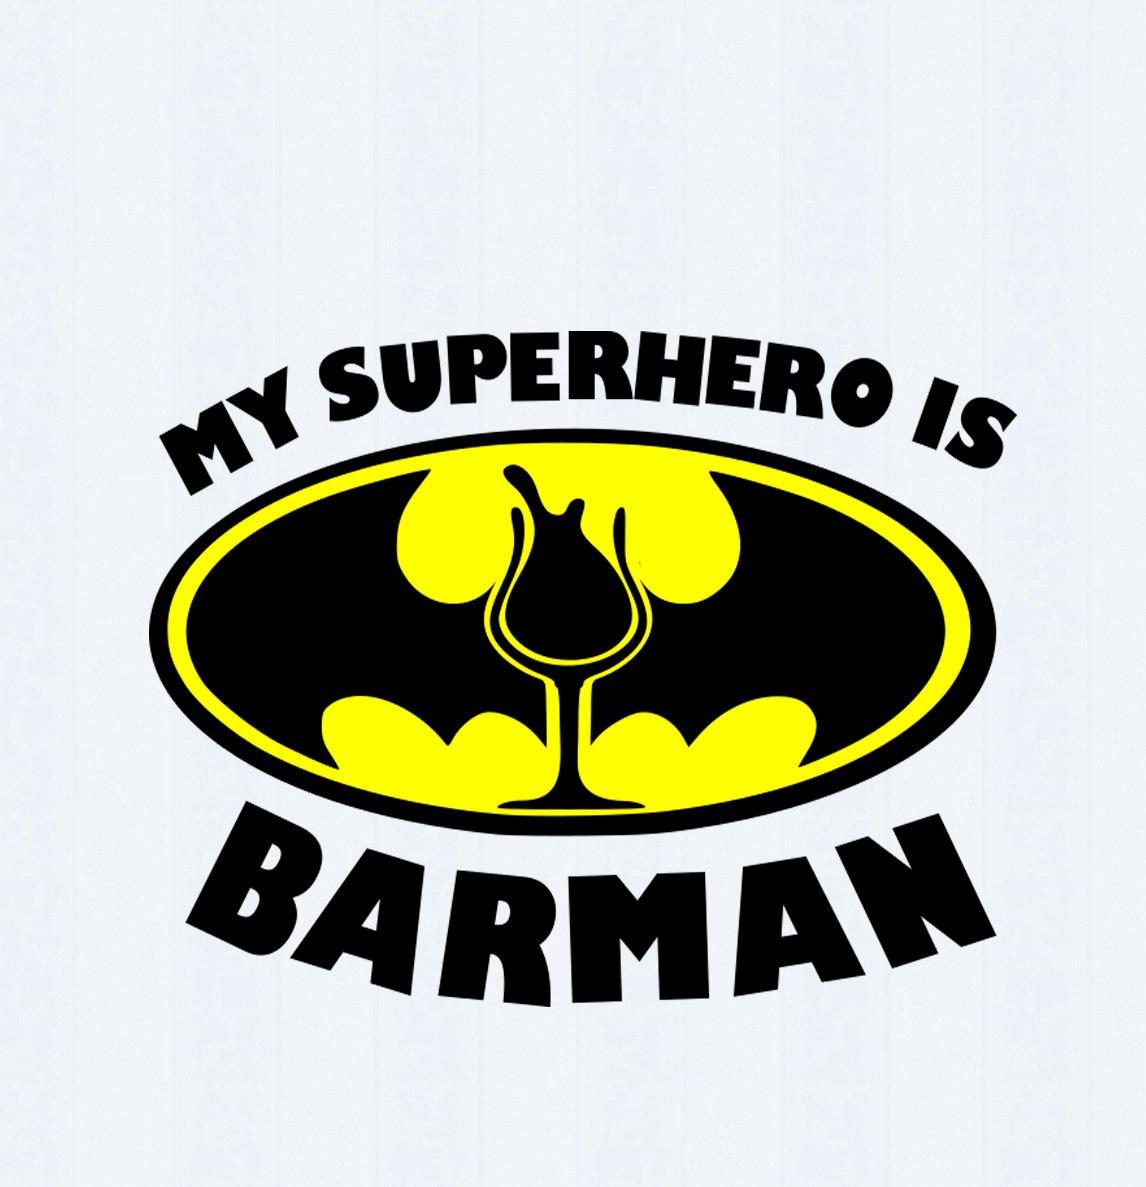 1146x1187 My Superhero Is Barman Svg,eps, Ai, Jpeg, Png Dxf,silhouette